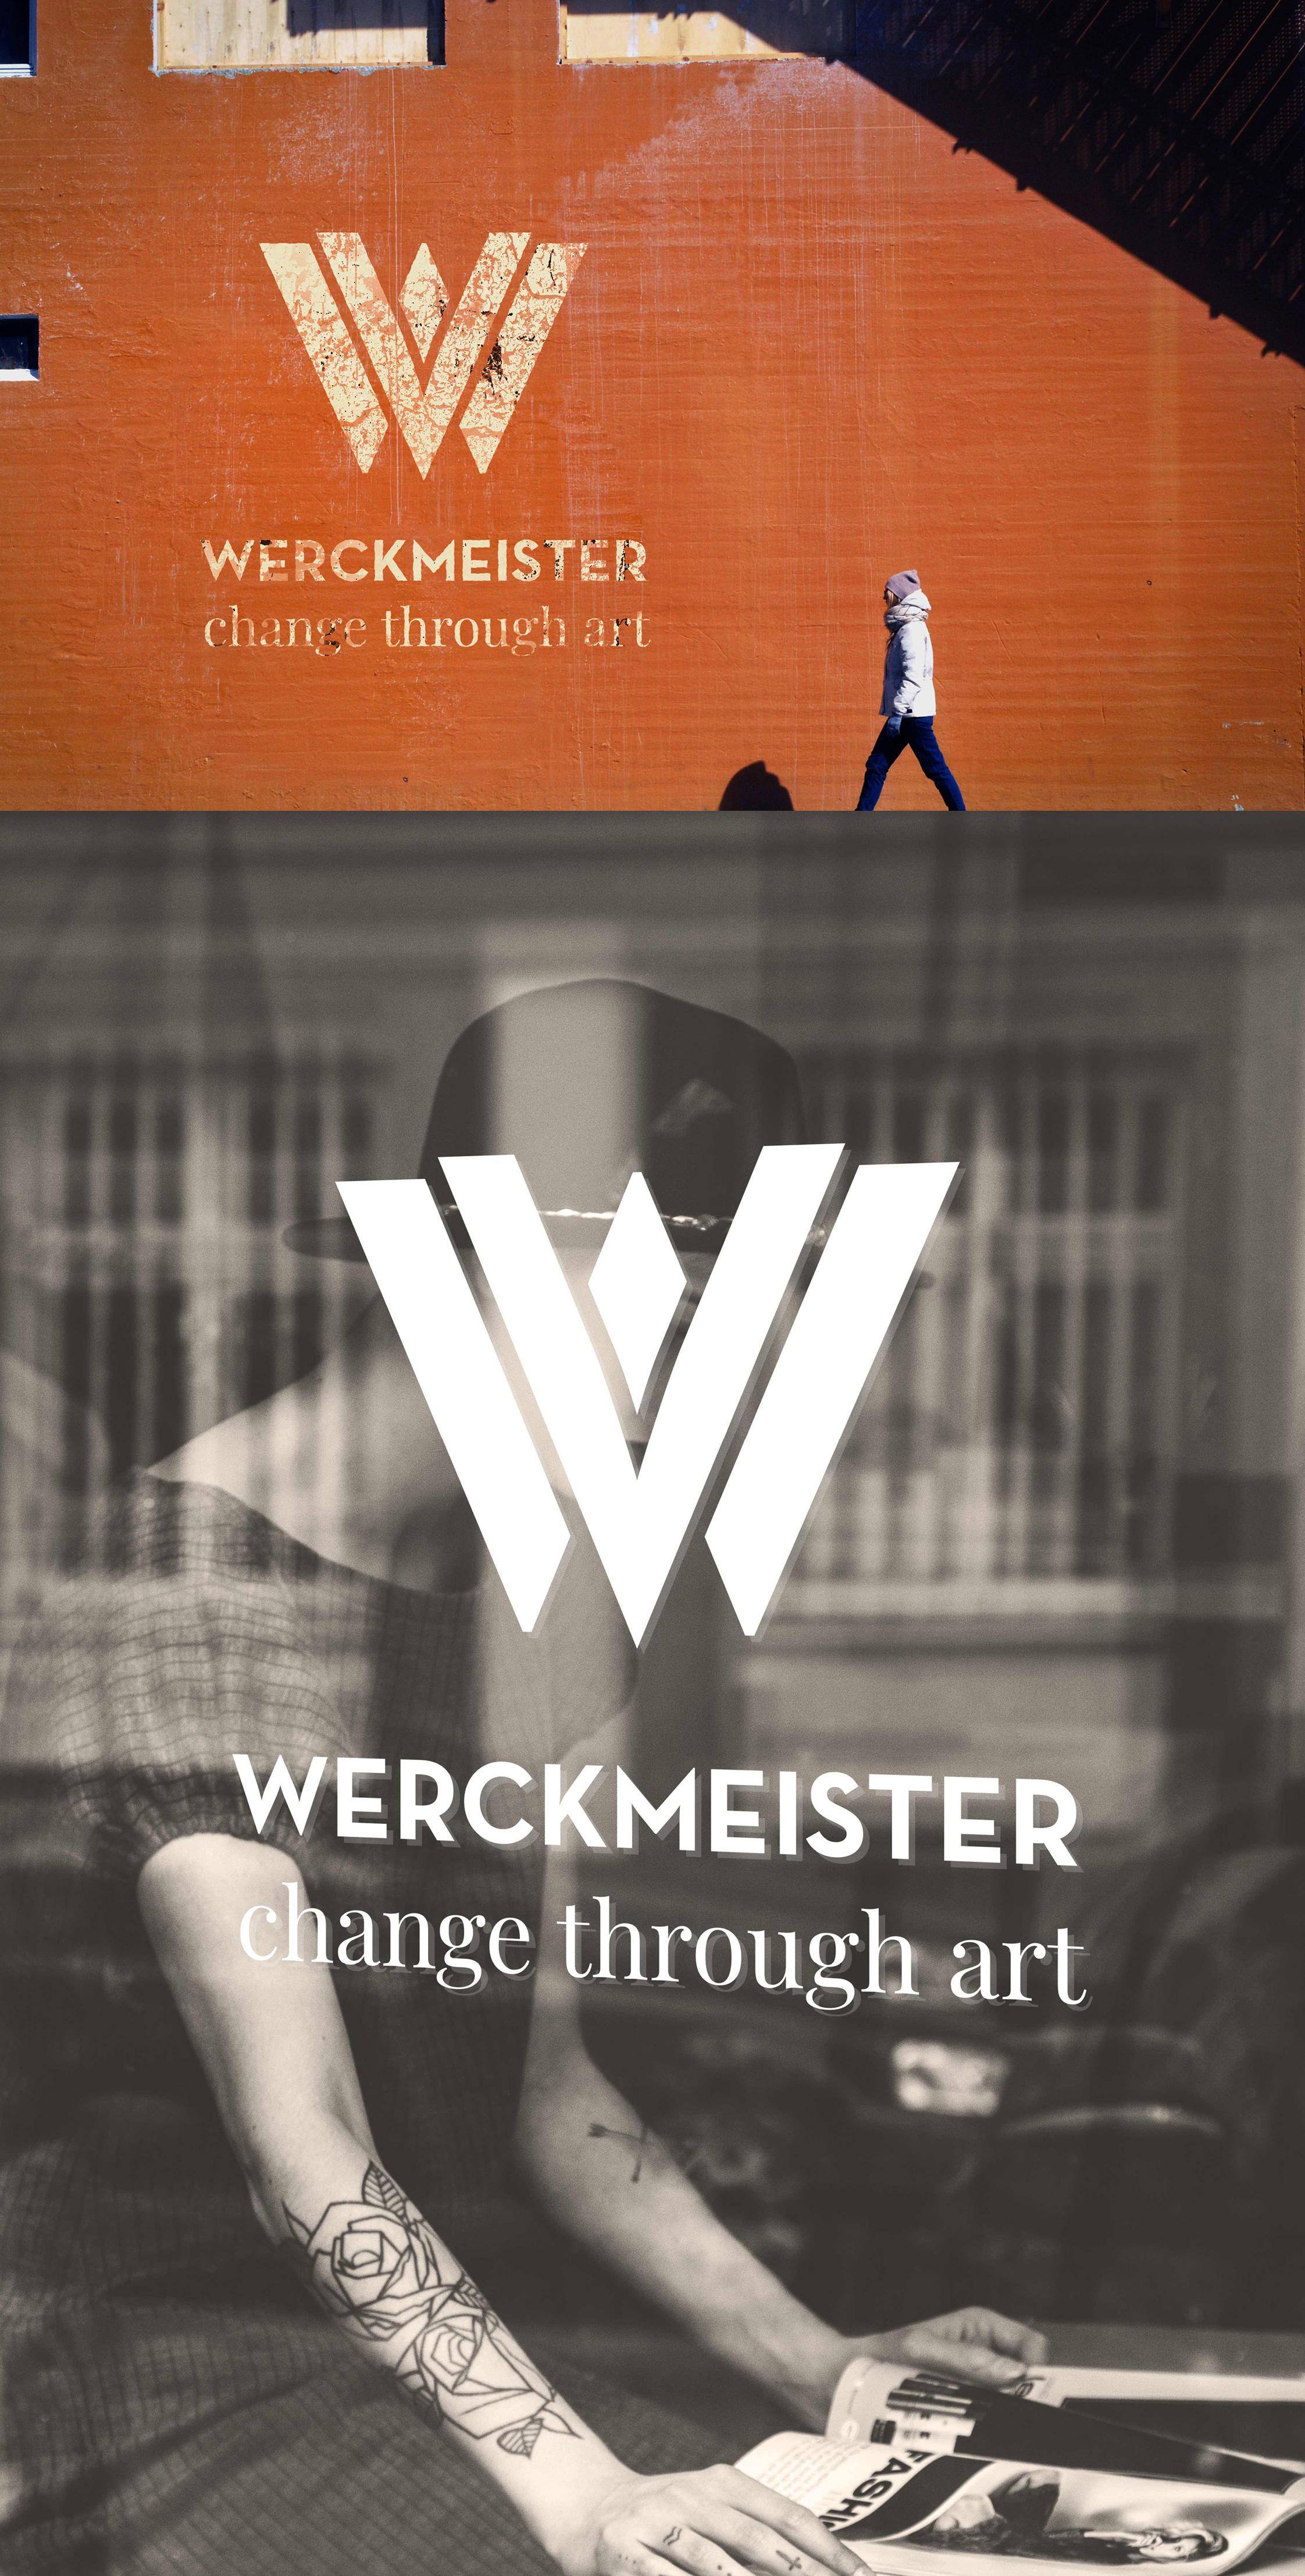 MARCA ARTISTA - VERÓNICA WERCKMEISTER by Sormen Komunikazioa, S.L. - Creative Work - $i